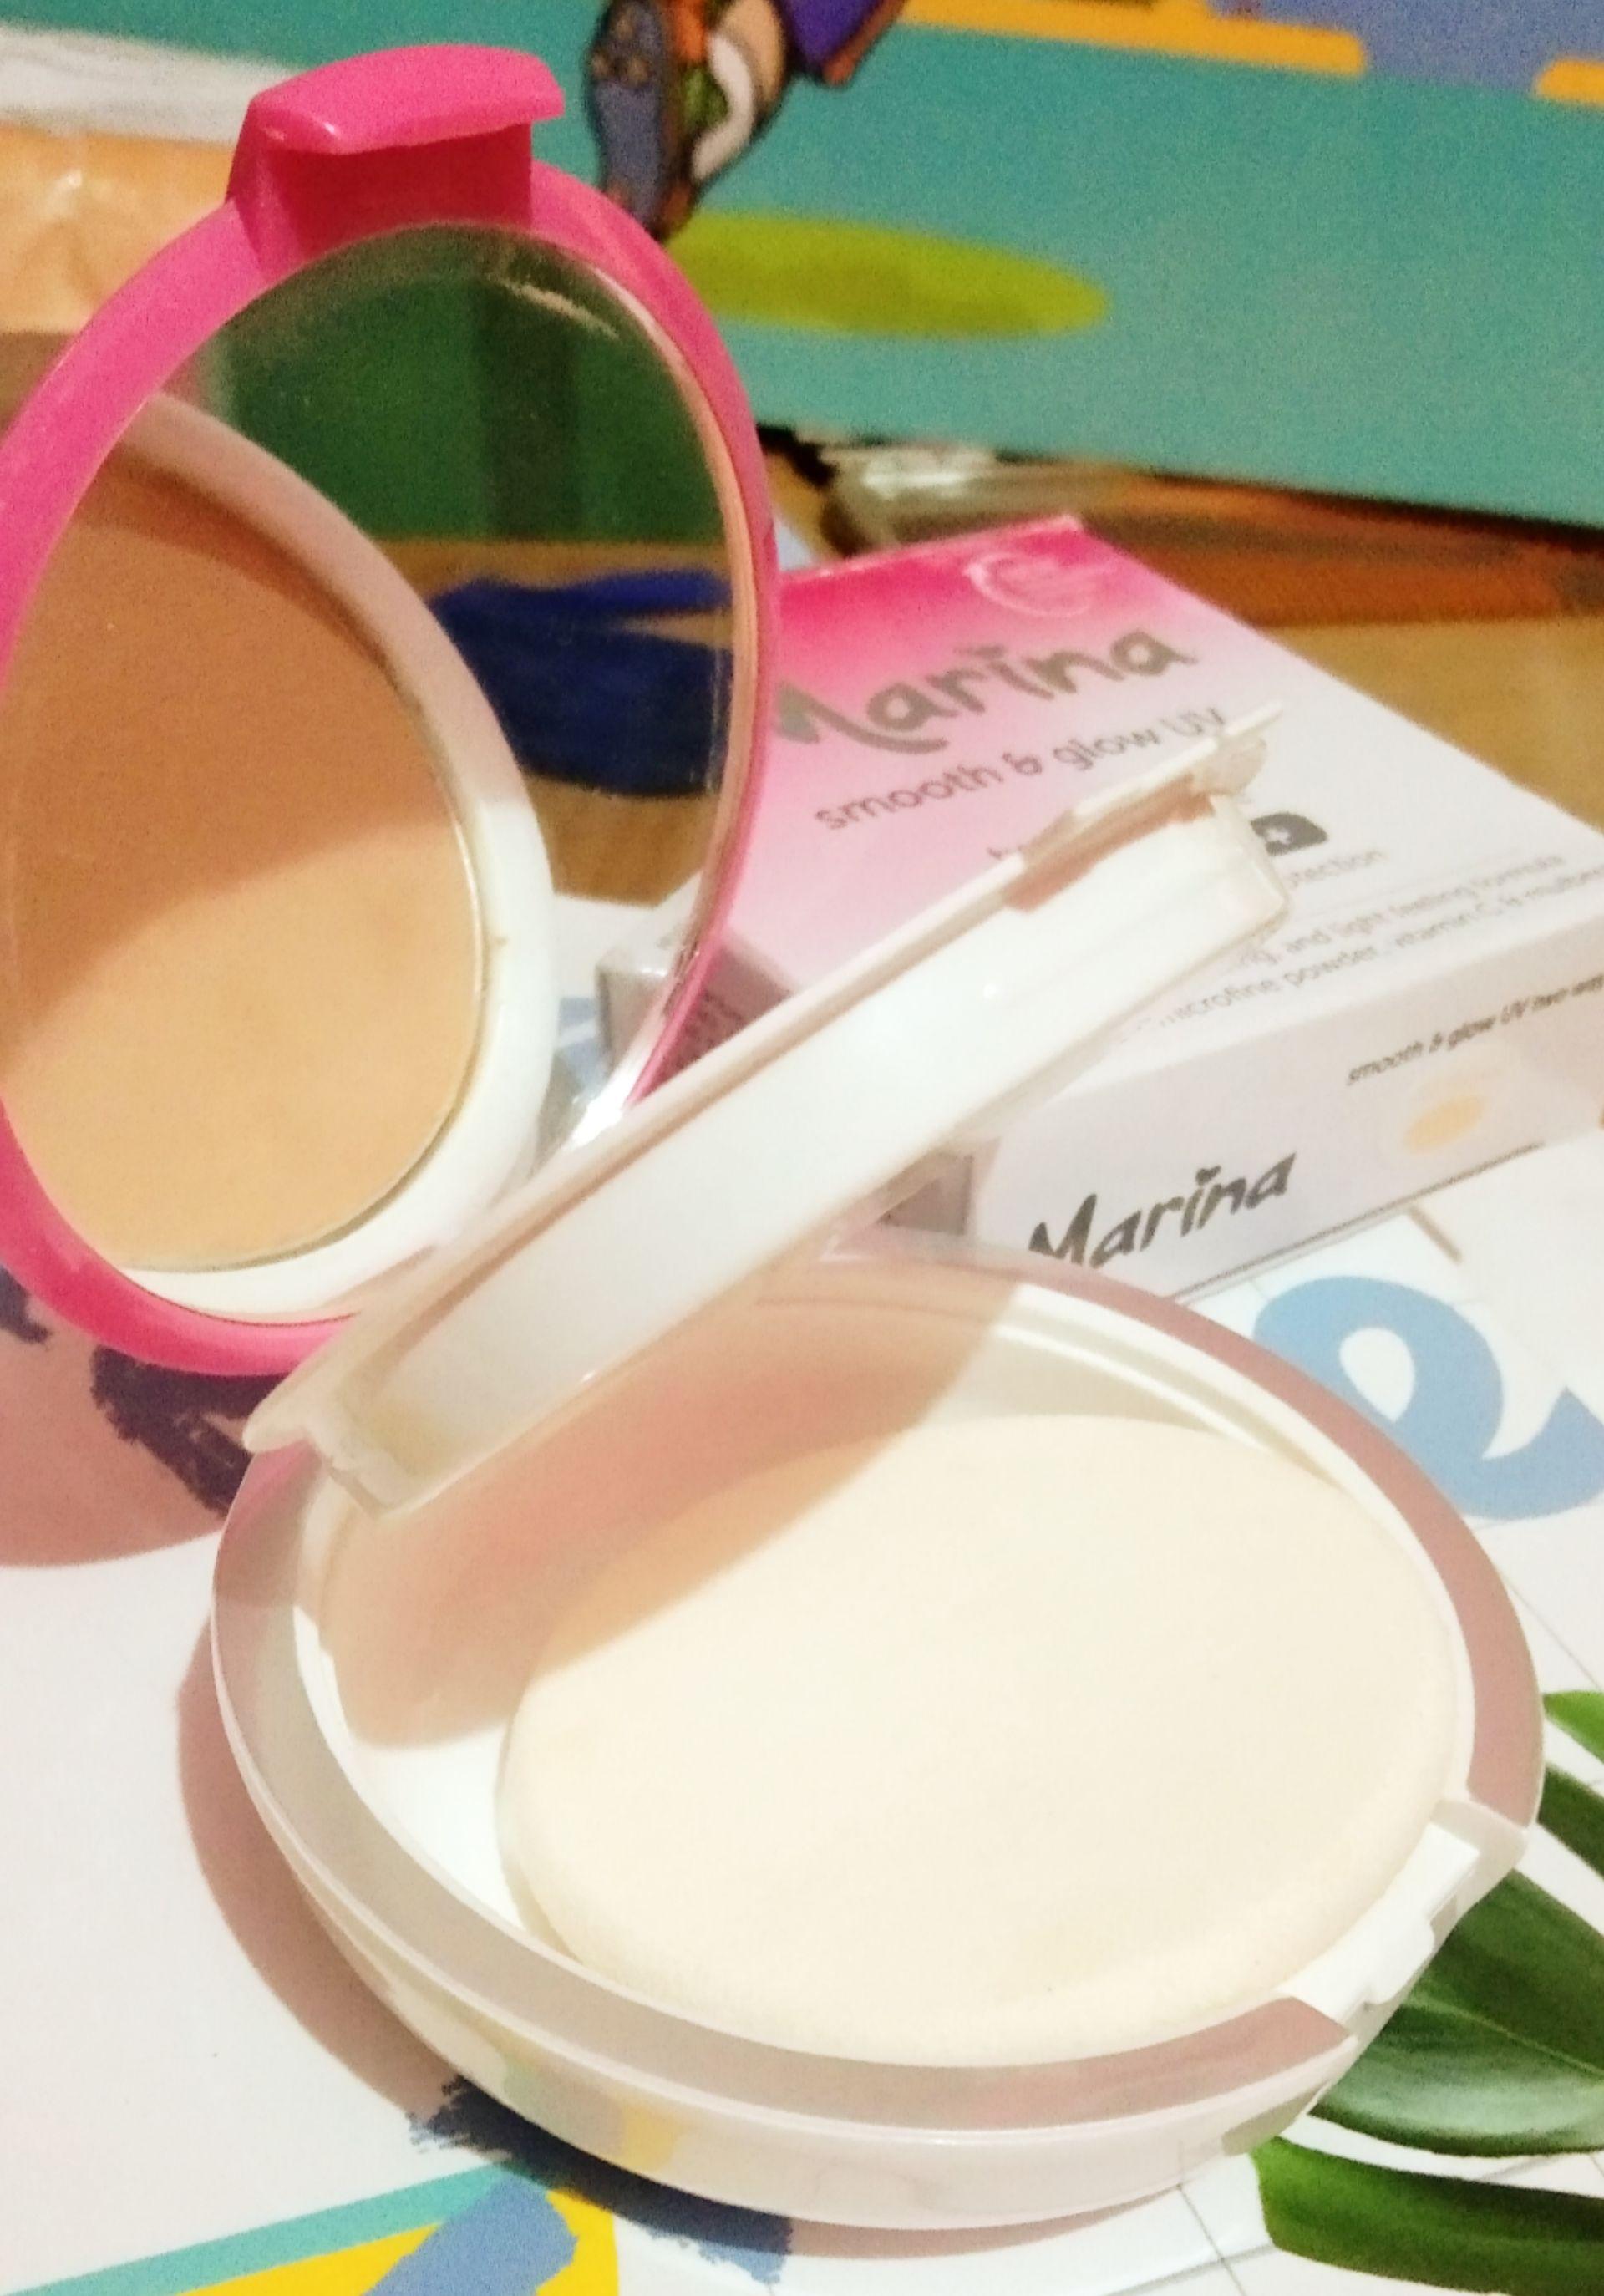 gambar review ke-3 untuk Marina Smooth & Glow UV Two Way Cake